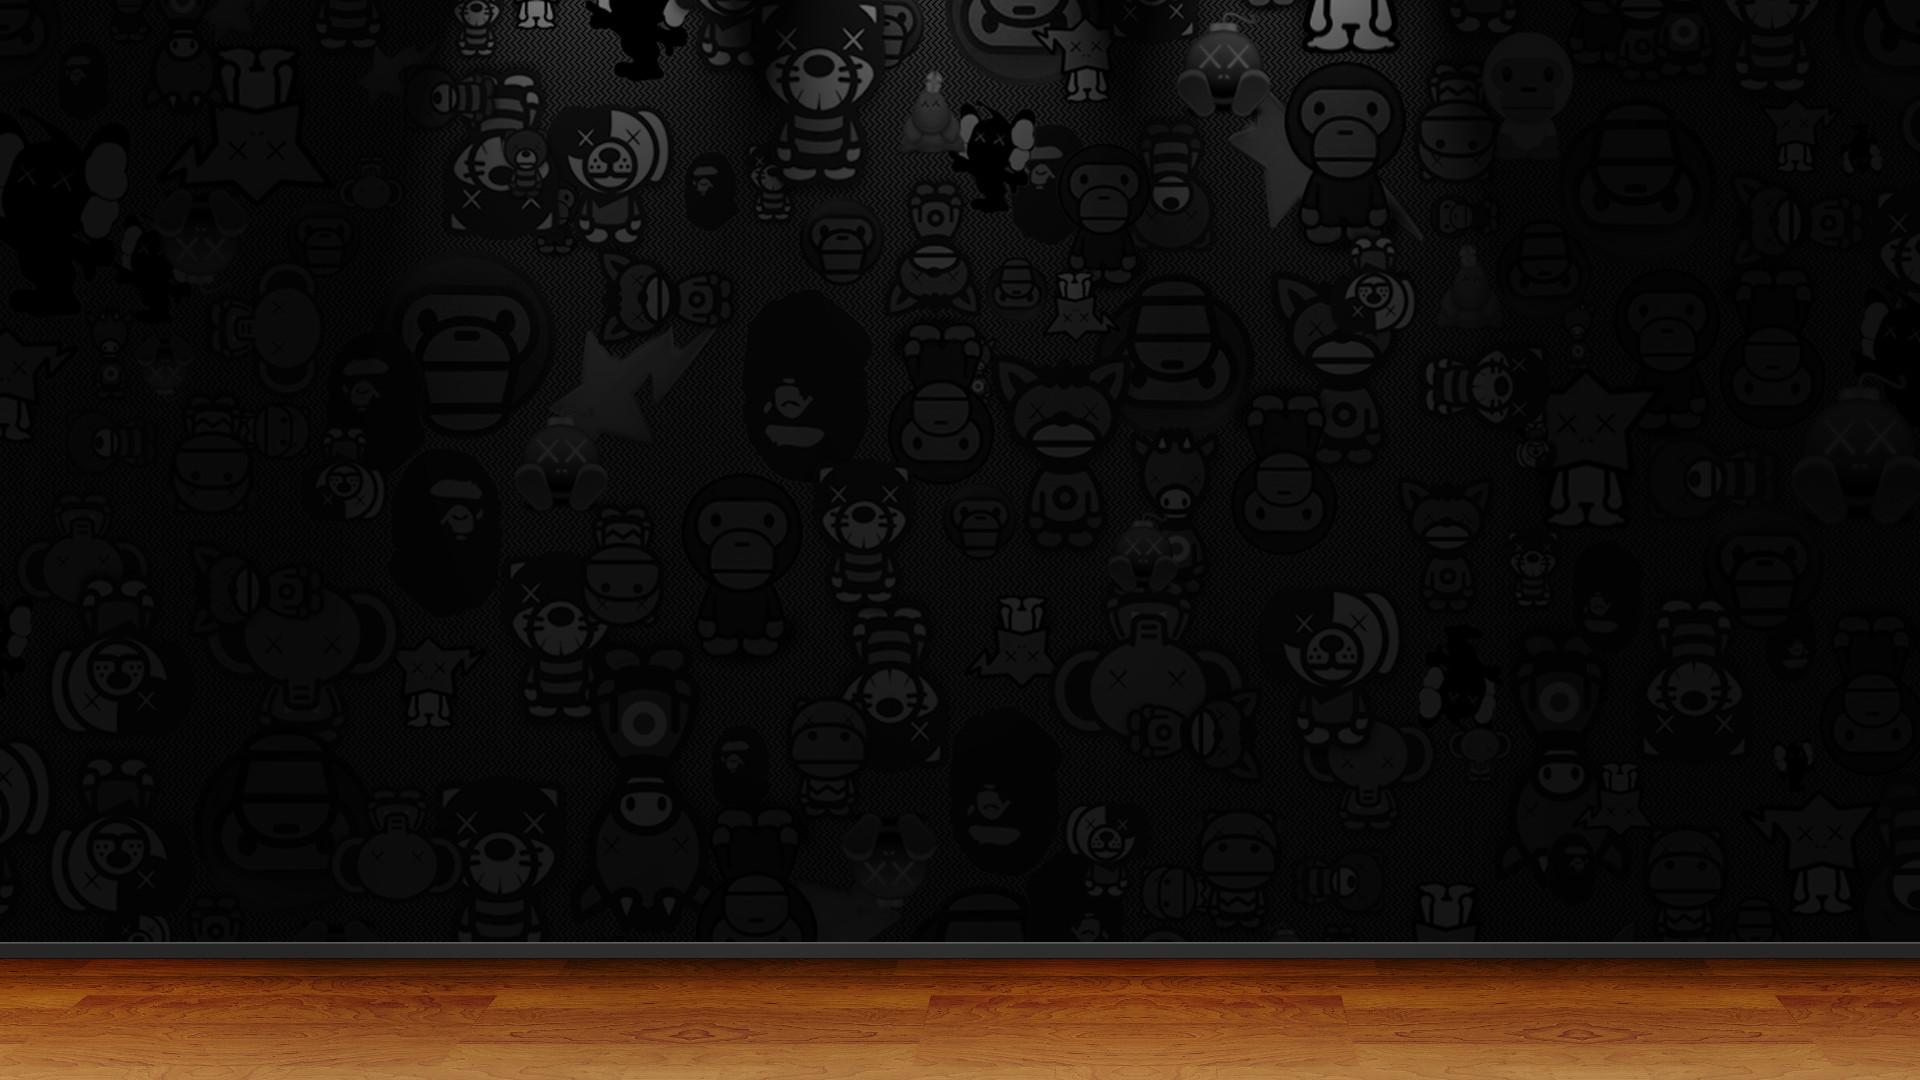 11 HD Bape Desktop Wallpapers For Free Download